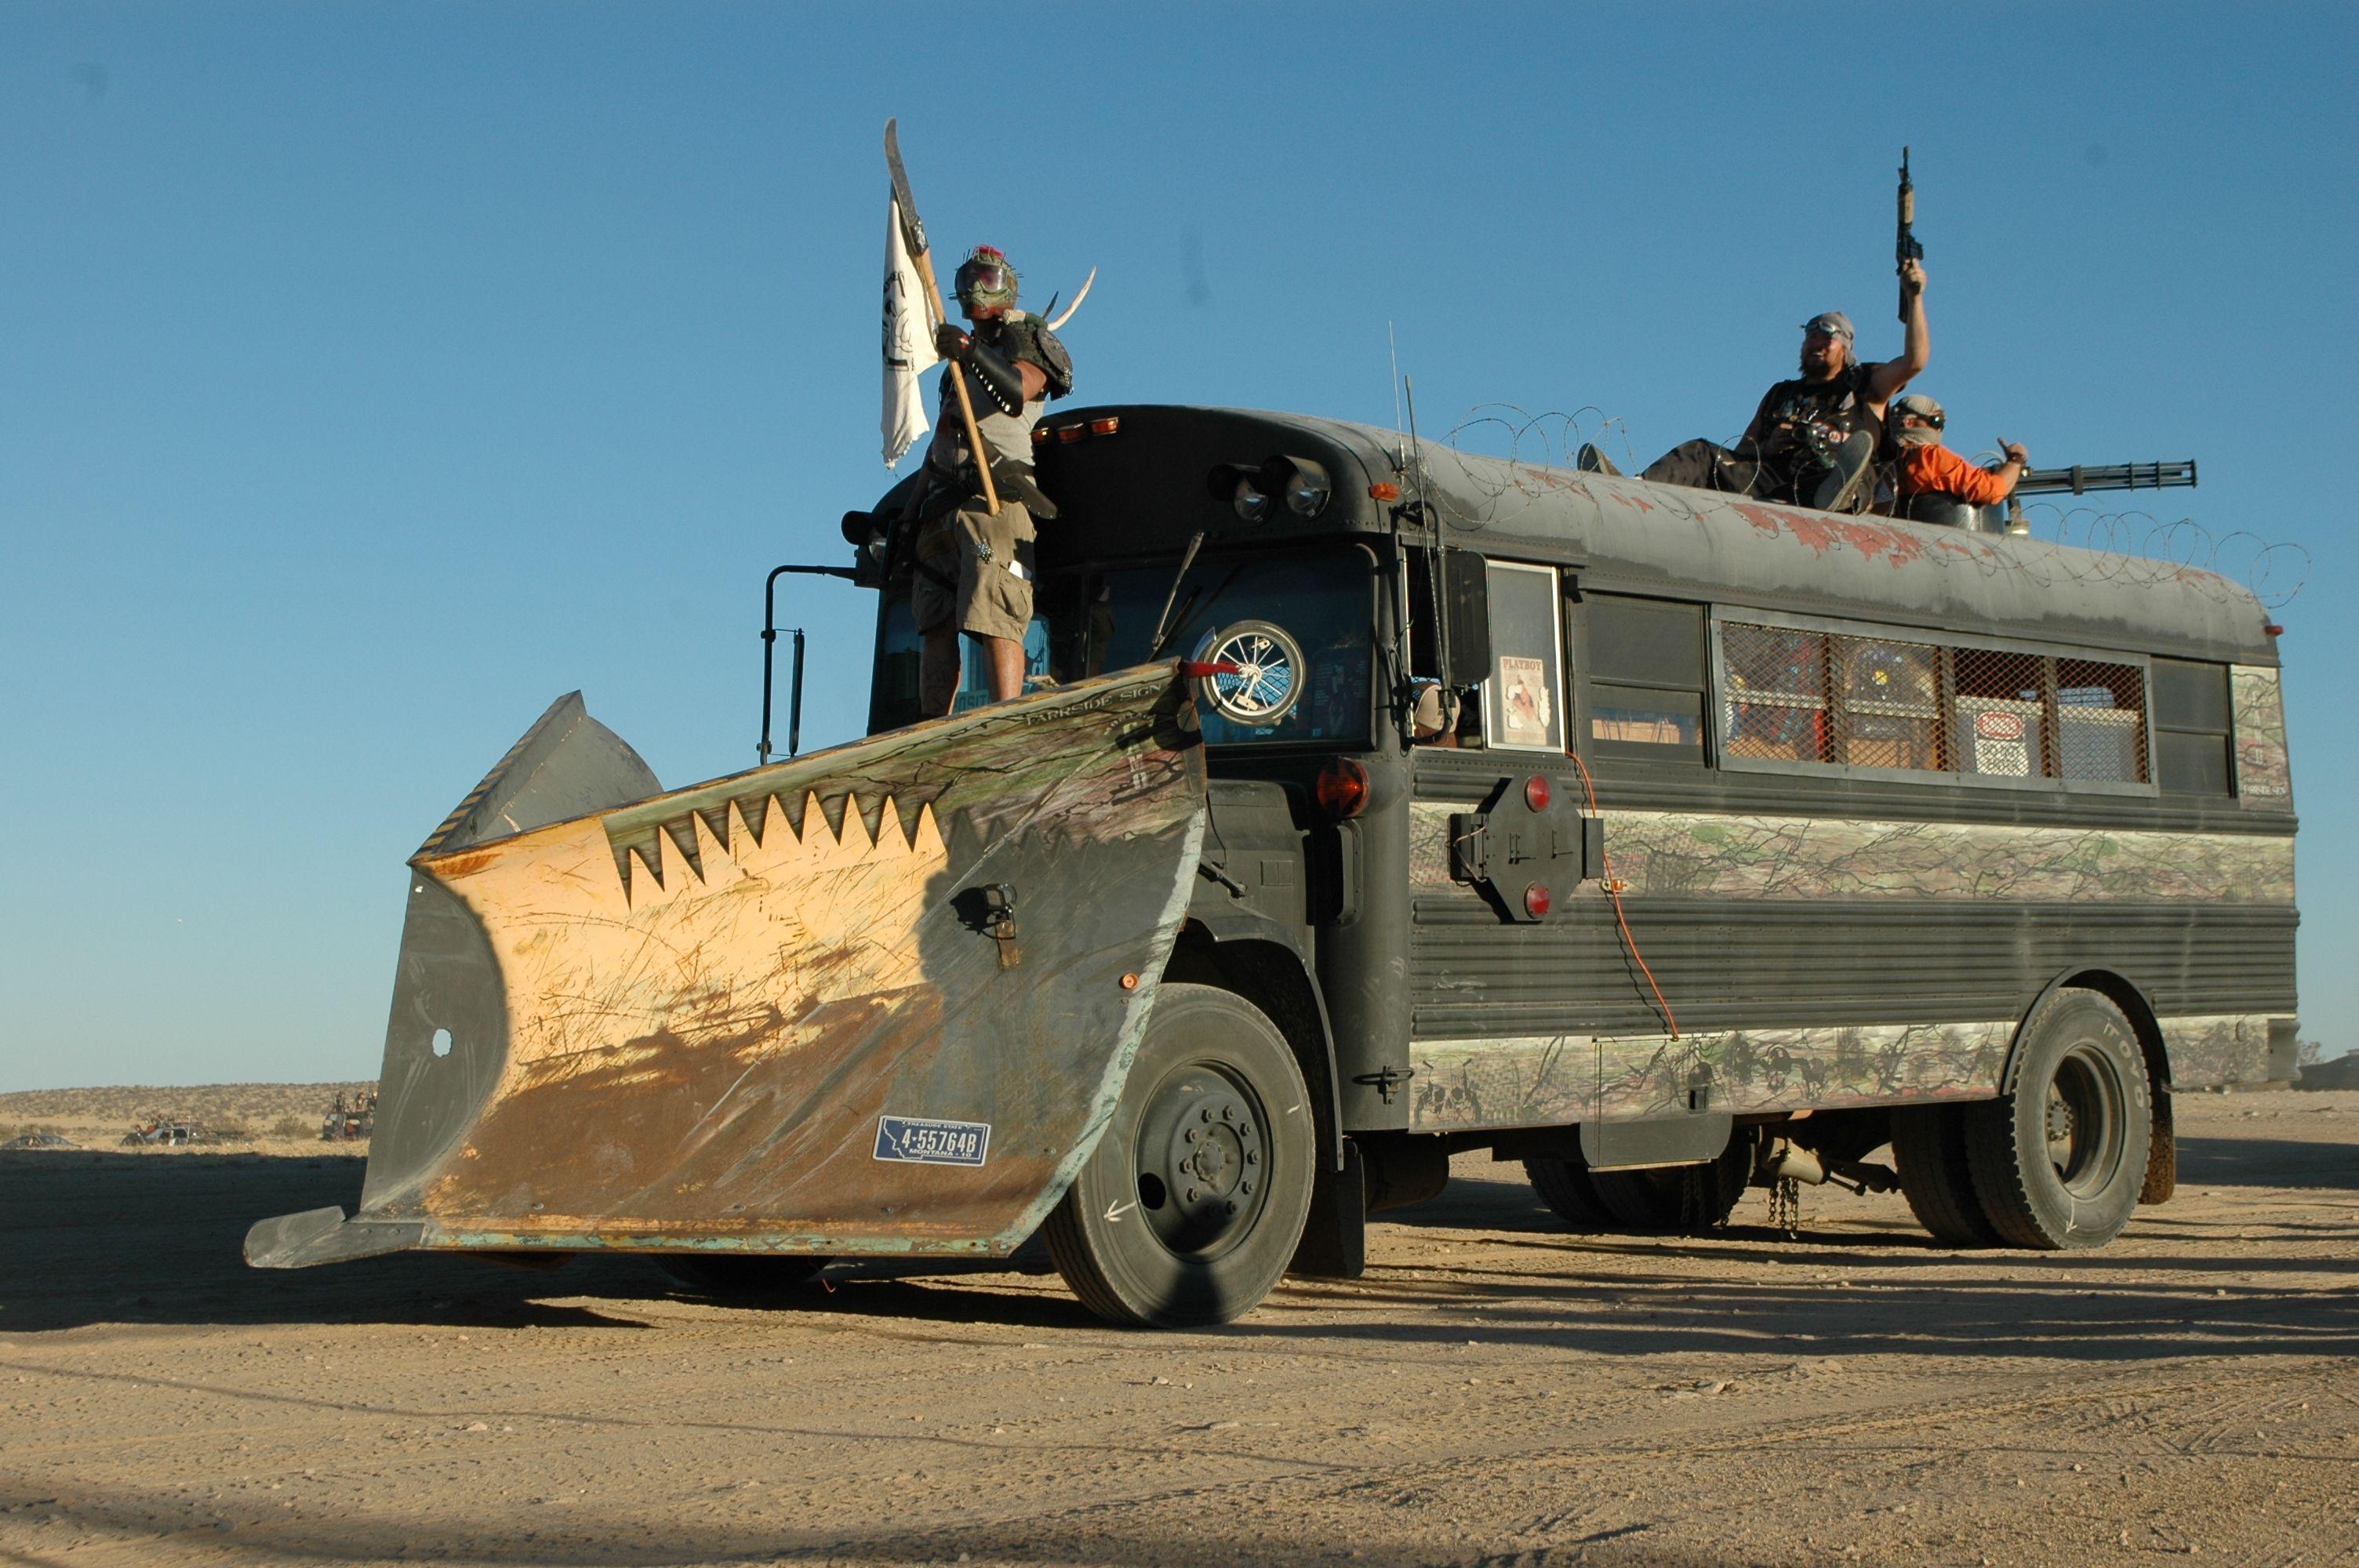 фото грузового автомобиля из ада подорвались мине уже